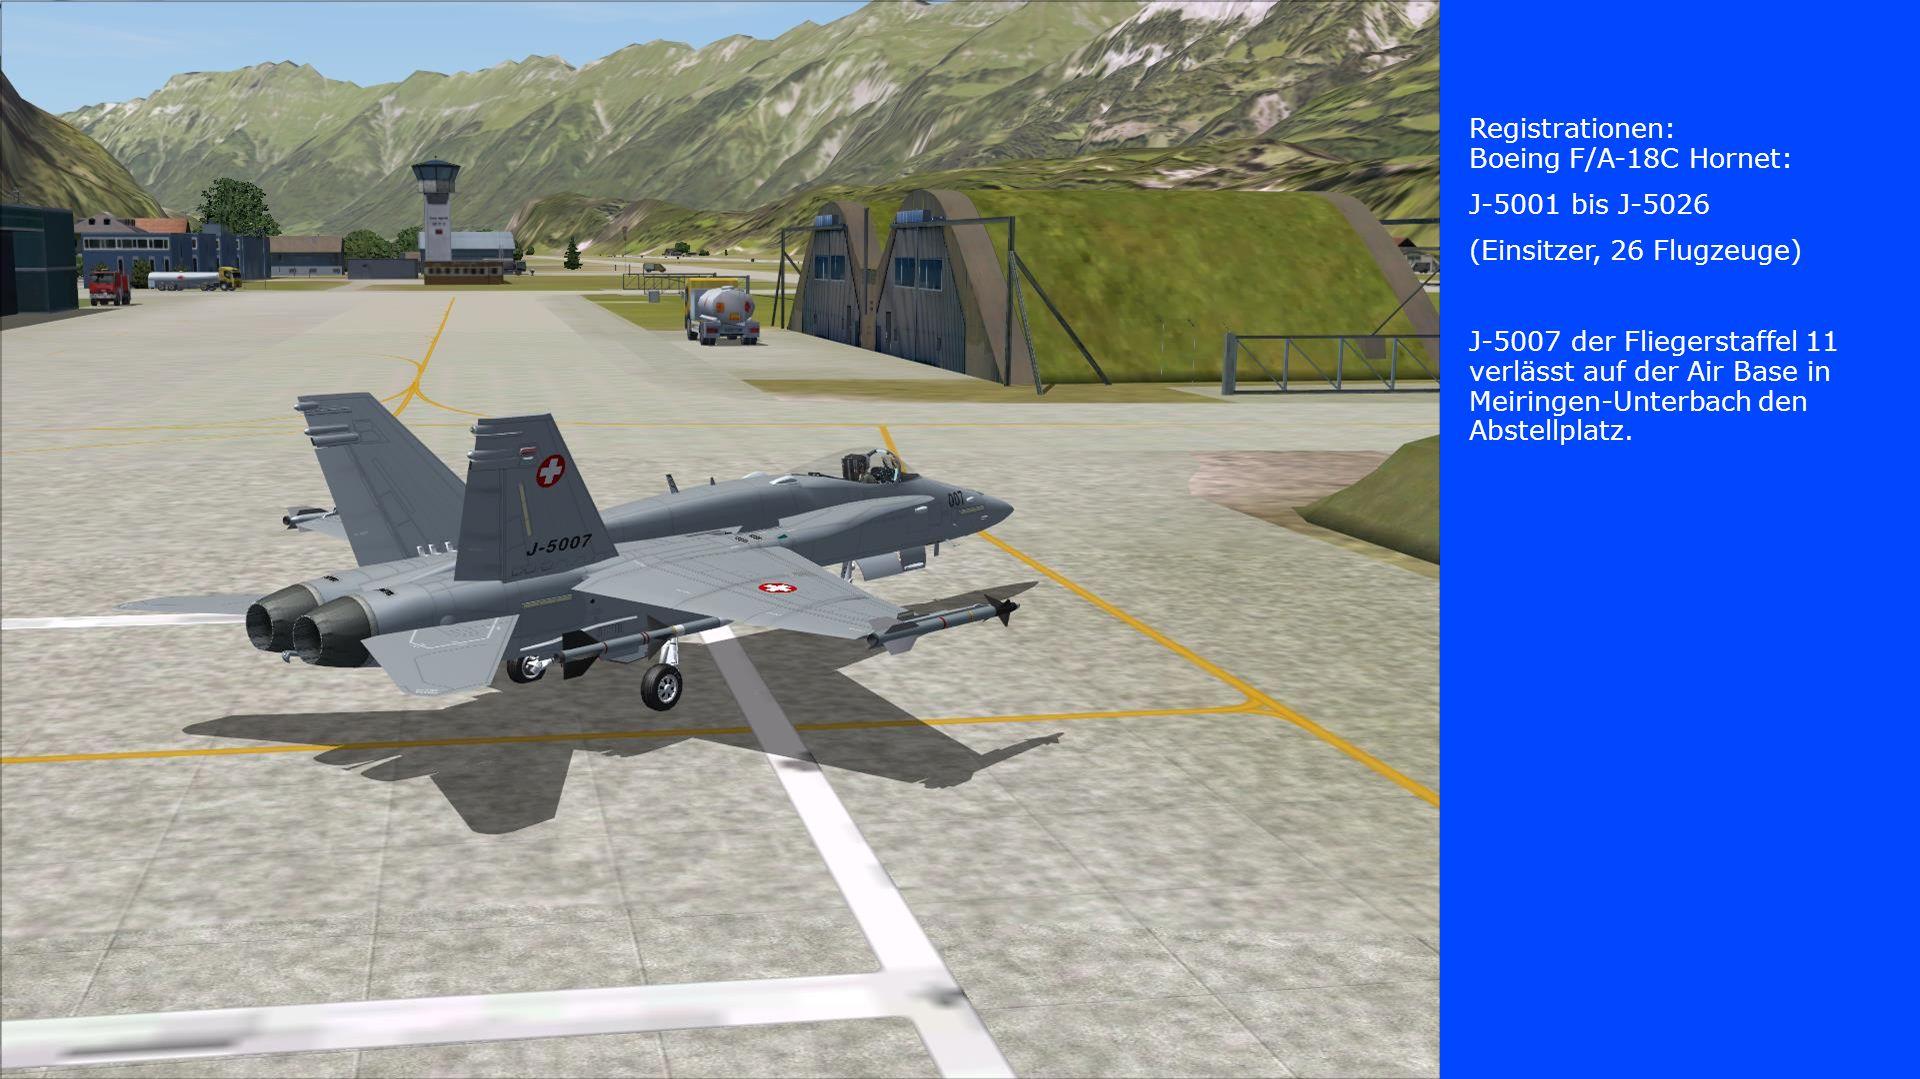 Registrationen: Boeing F/A-18C Hornet: